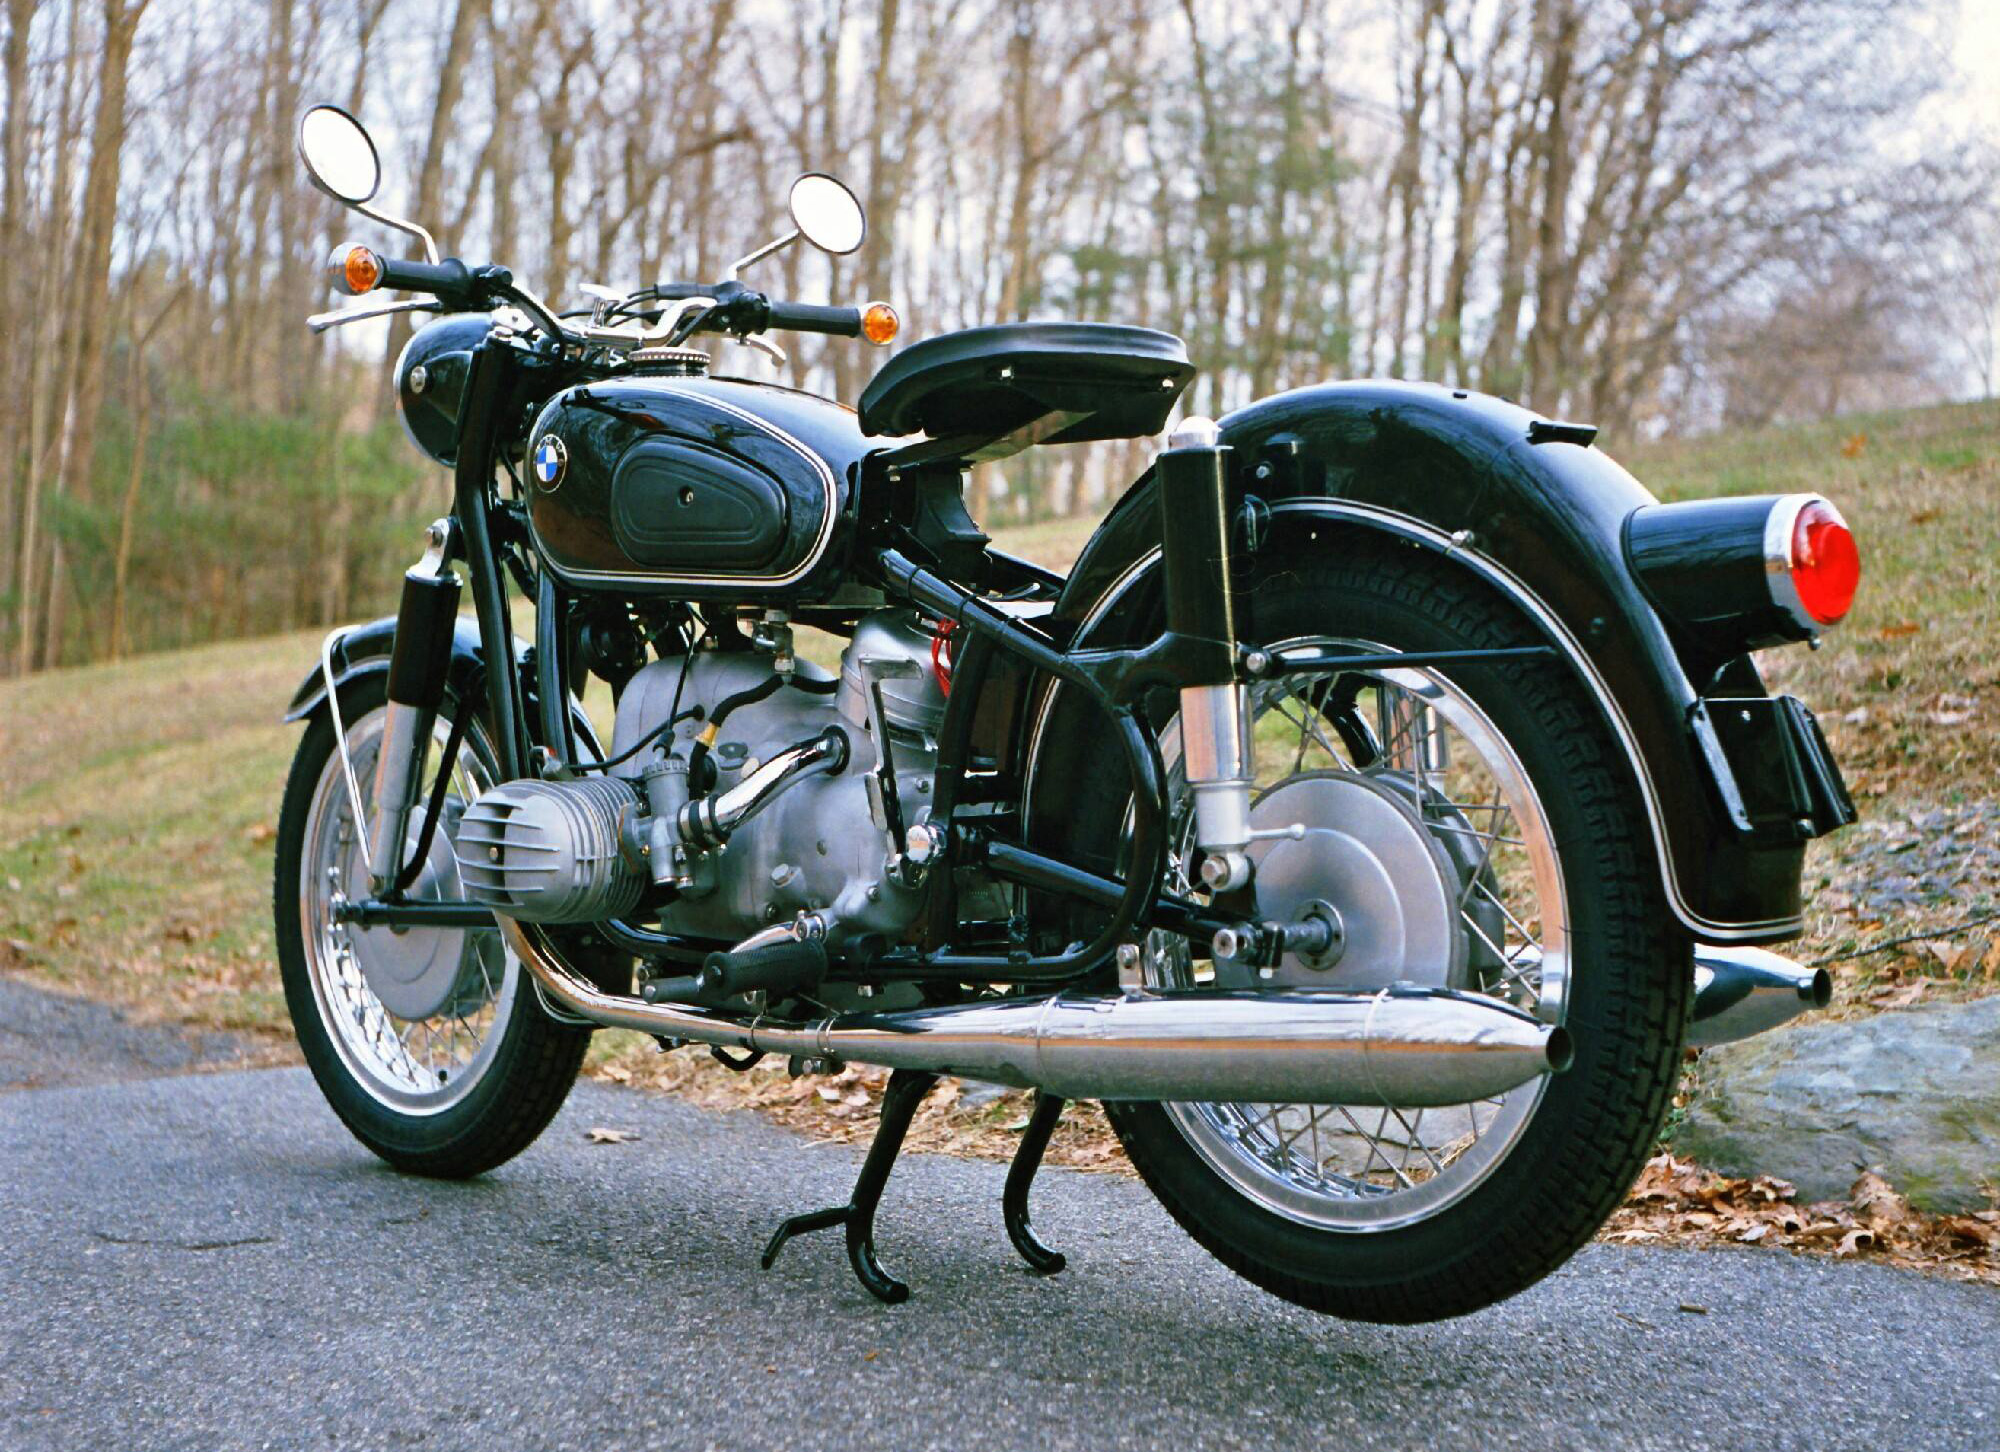 Scottie's Workshop Restores Vintage BMW Motorcycles | Cycle World